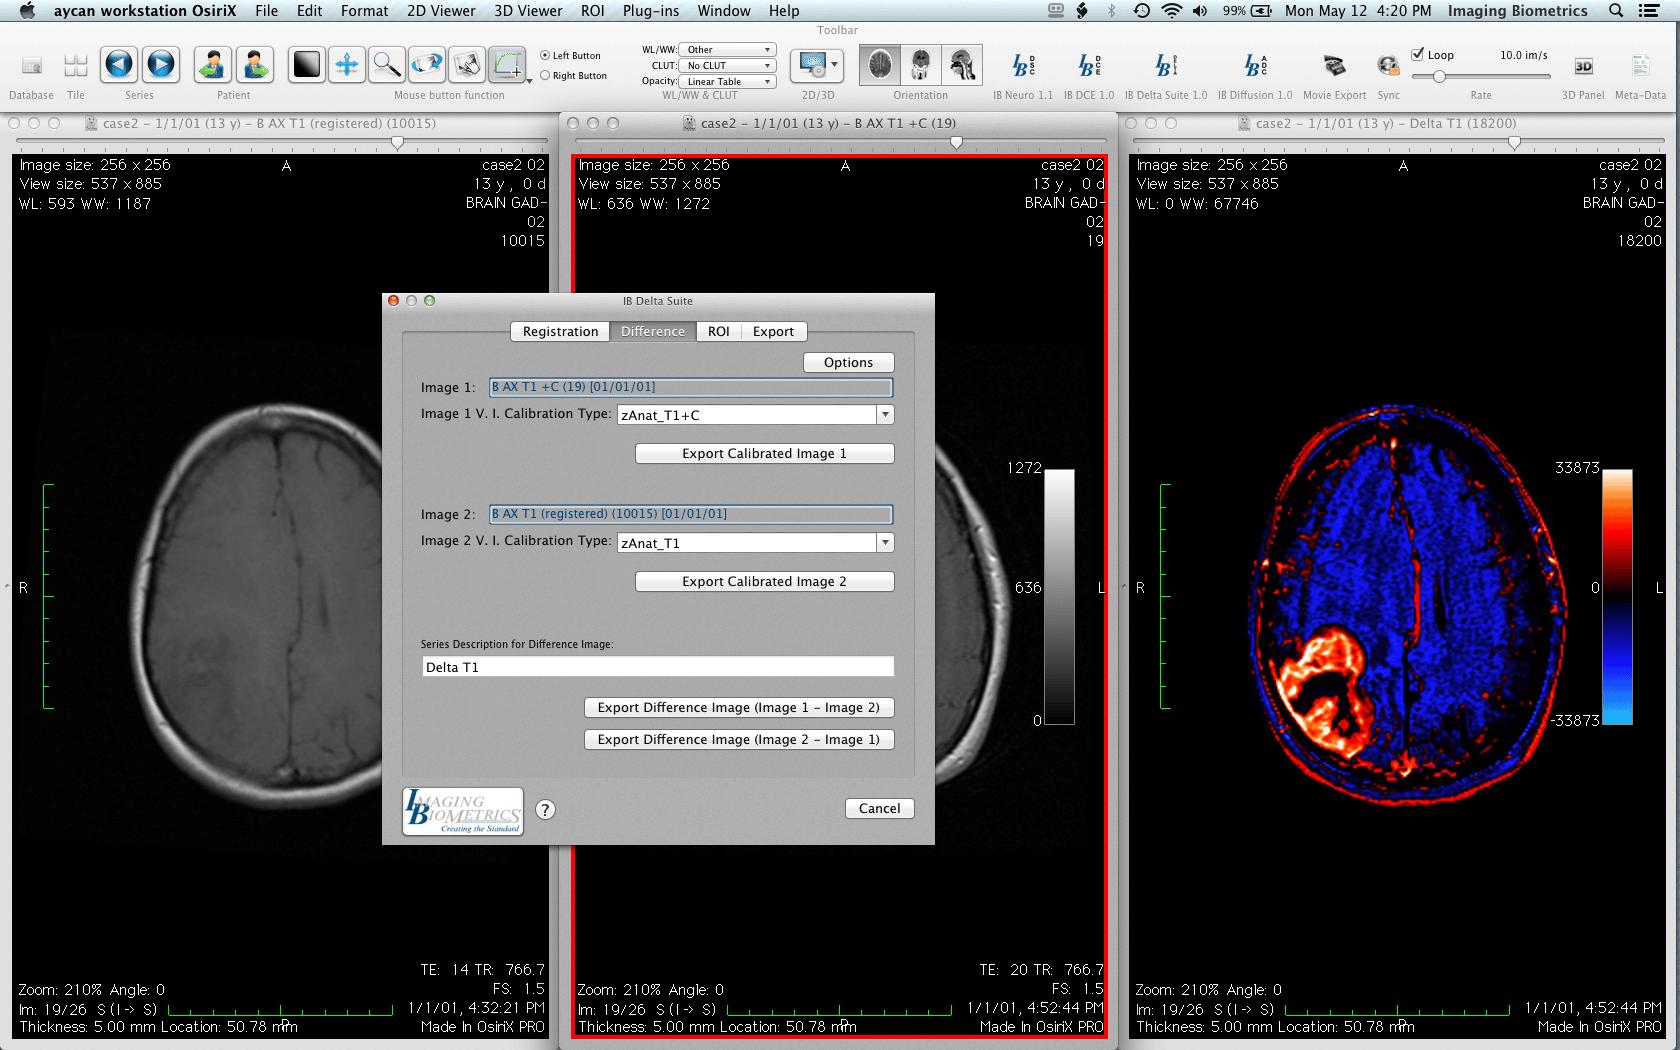 aycan workstation imaging biometrics Delta Suite T1